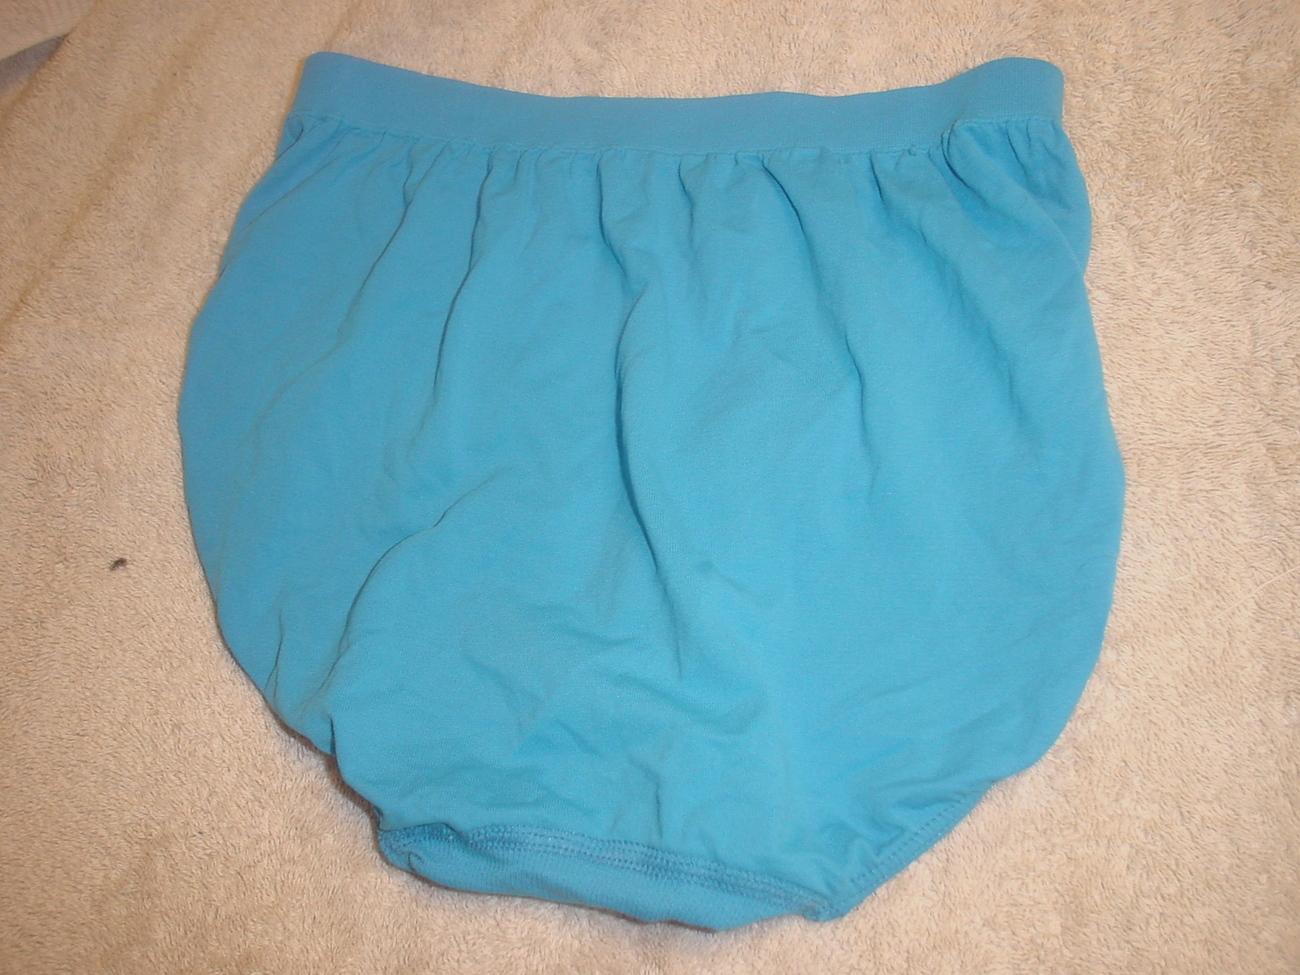 Jockey Seamfree Panty 5/Small Dark Blue  SP-Slightly Imperfert NWOT Lot of 2